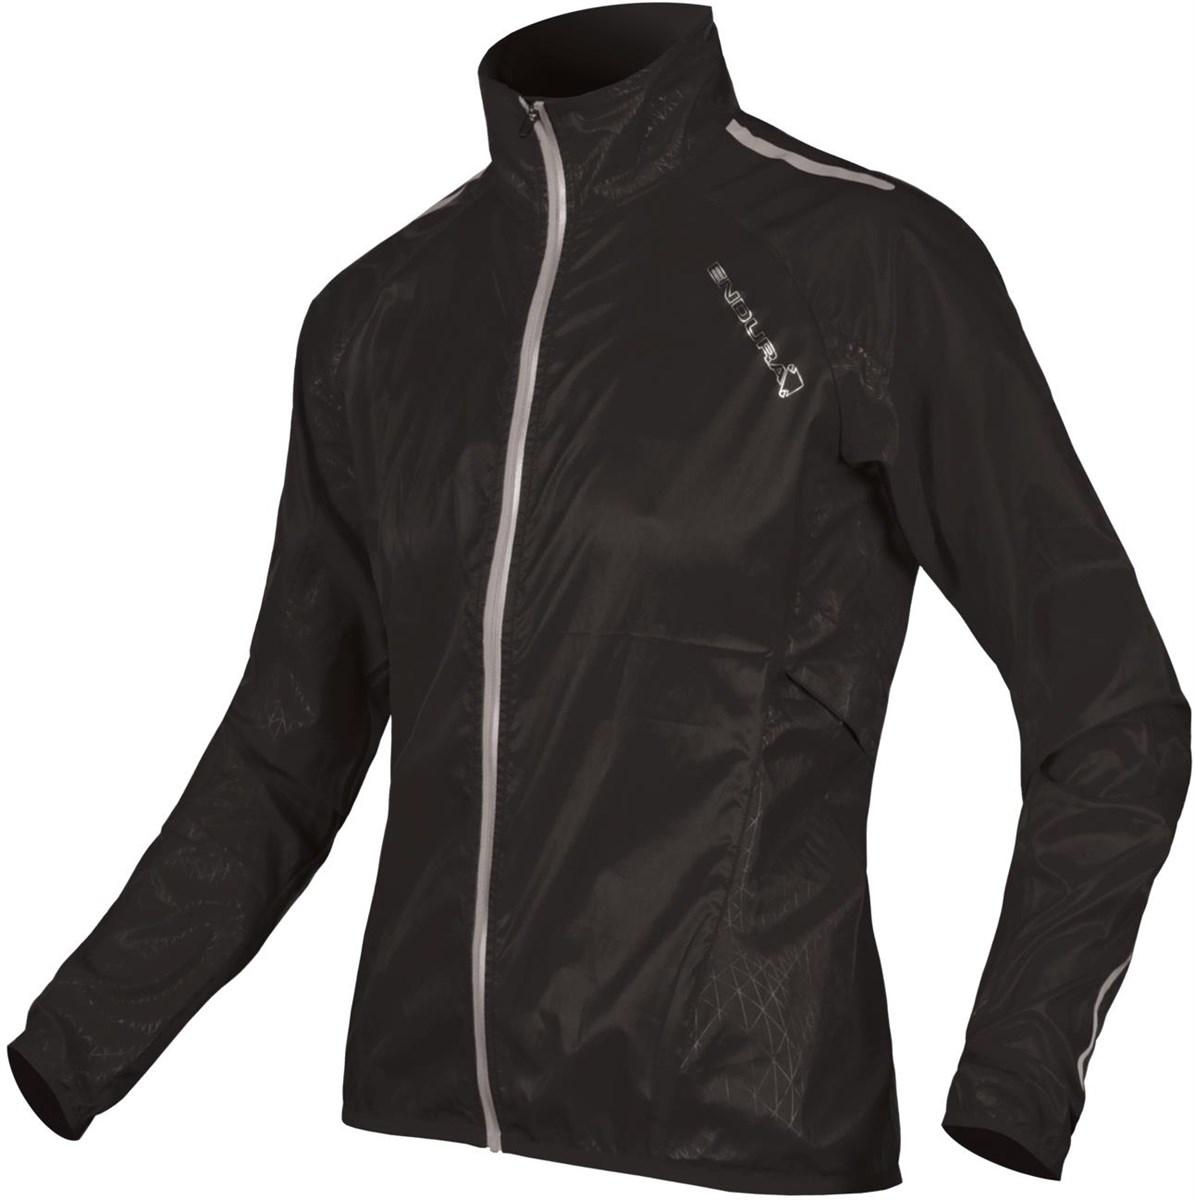 Endura Pakajak II dame cykeljakke - Black L. | Jackets